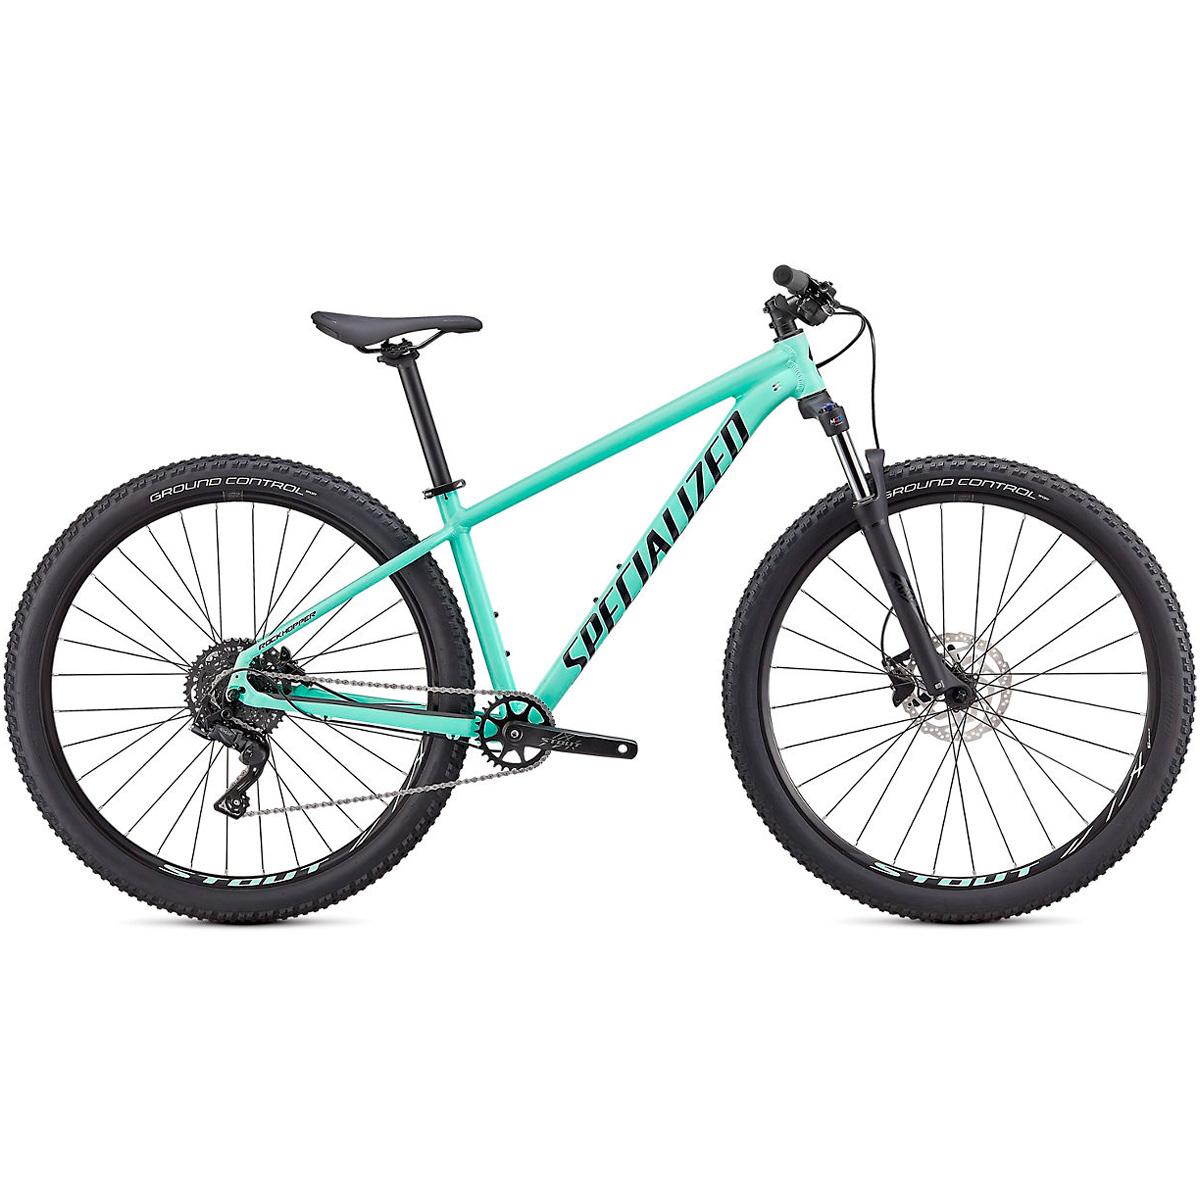 Bicicleta Specialized Rockhopper Comp 29 2021